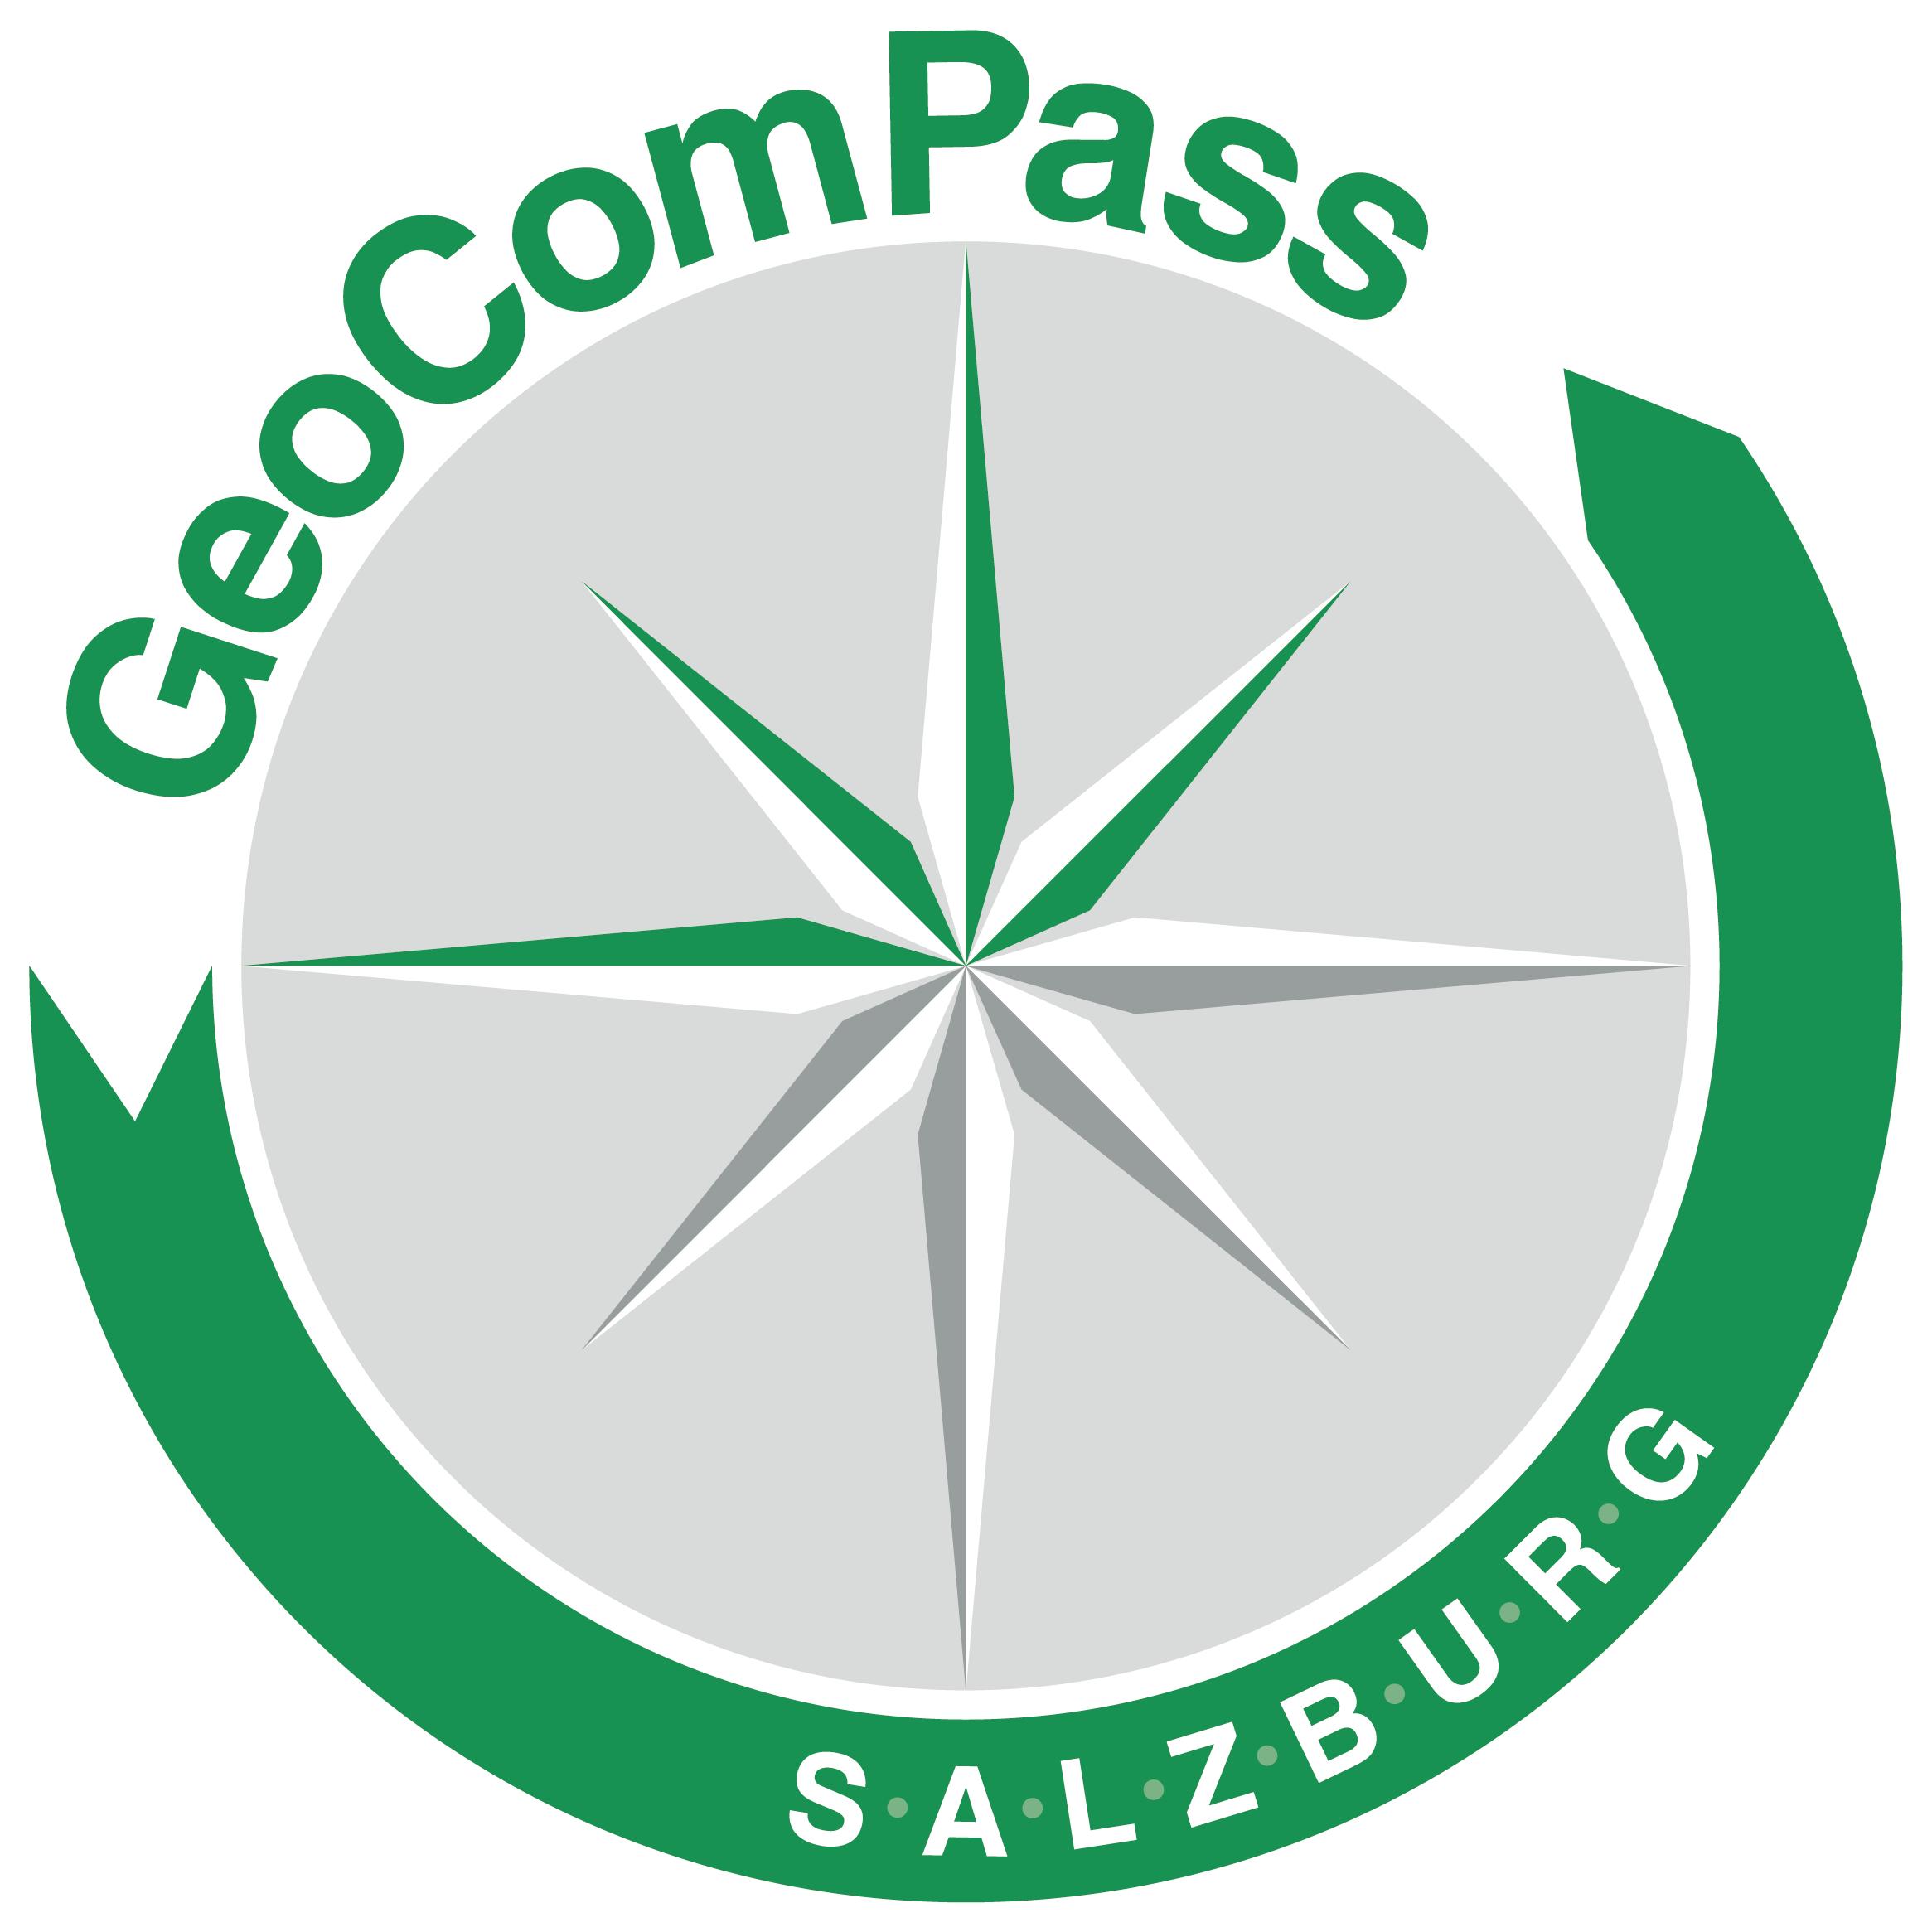 Geocompass Logo